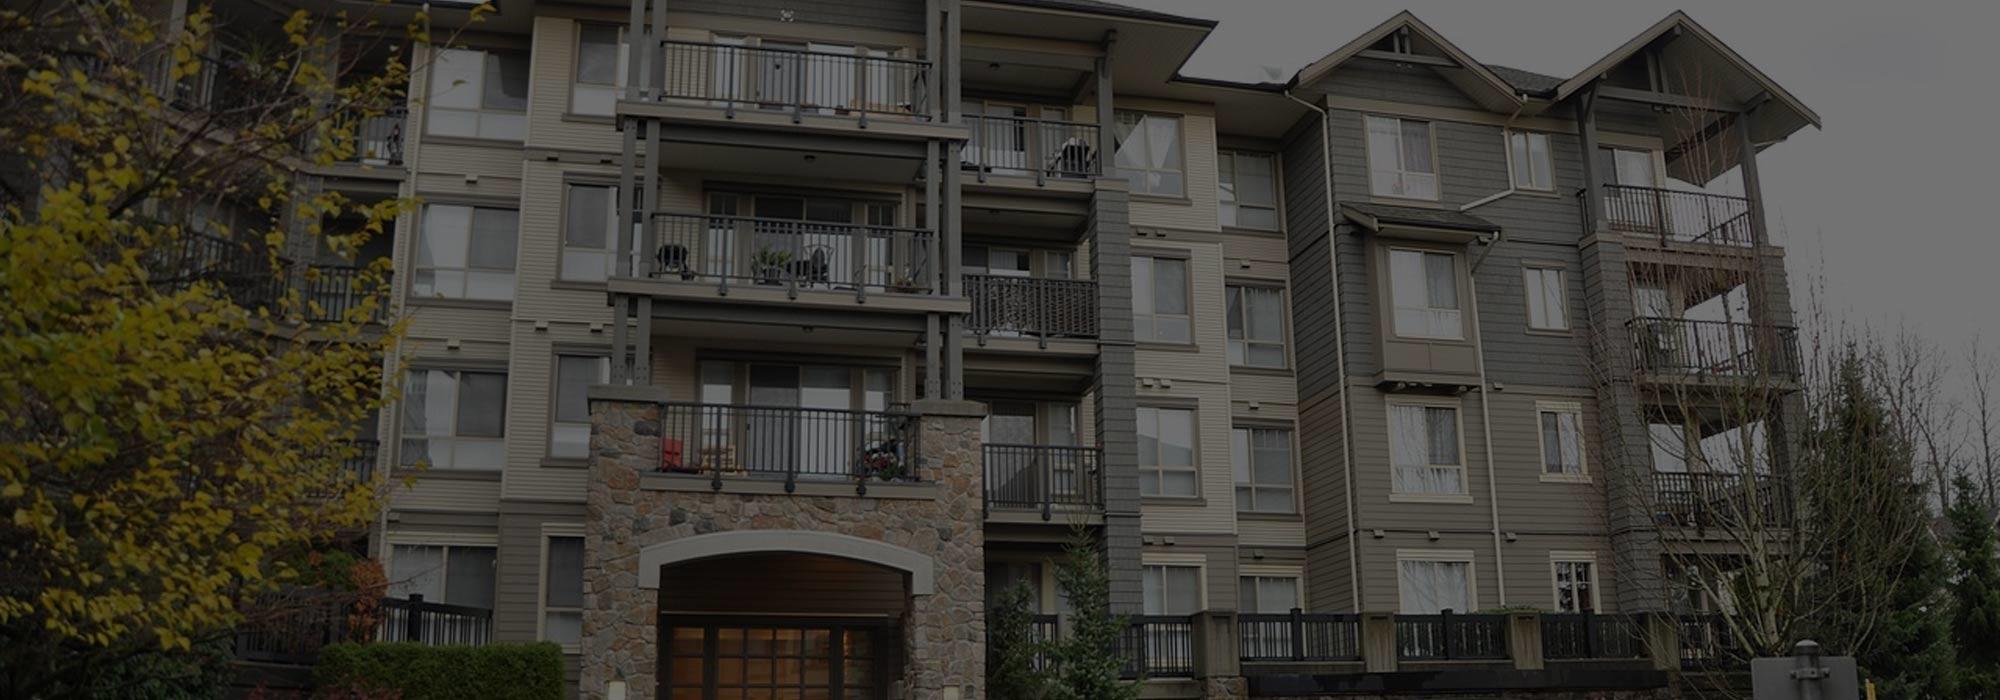 Team 3000 Property Management Ltd - Burnaby, BC V3J 1N3 - (604)240-2749   ShowMeLocal.com